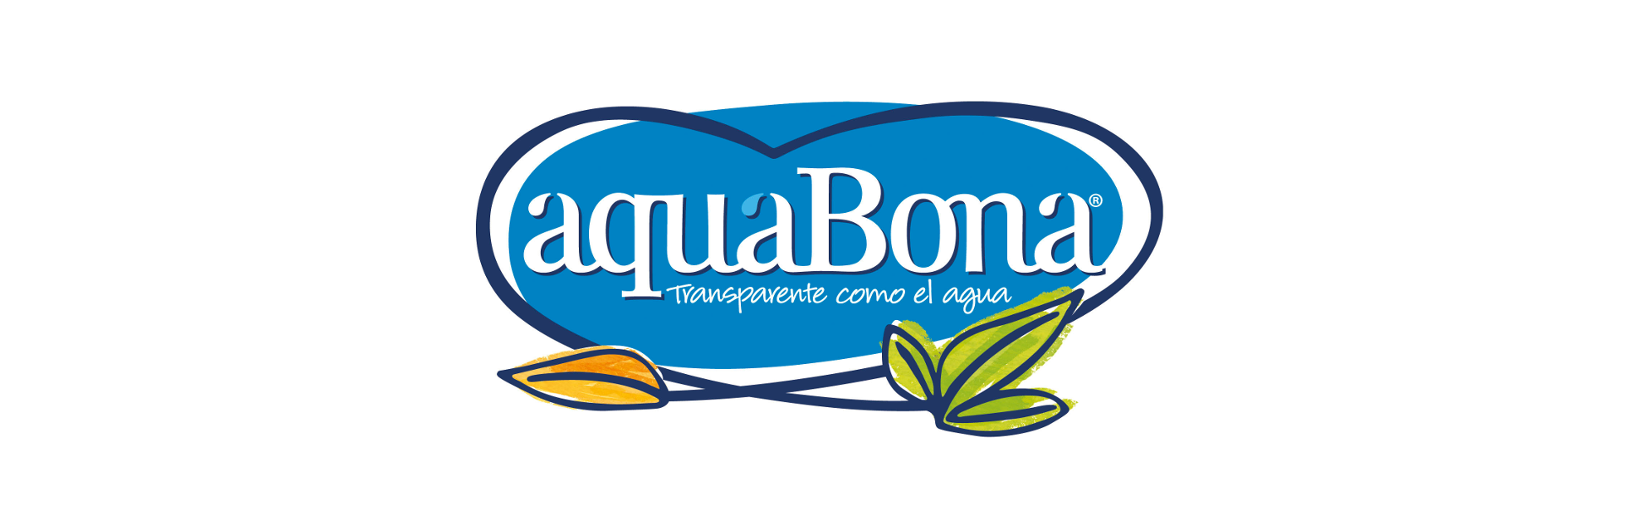 logo-aquabona-gcom-limonium-web